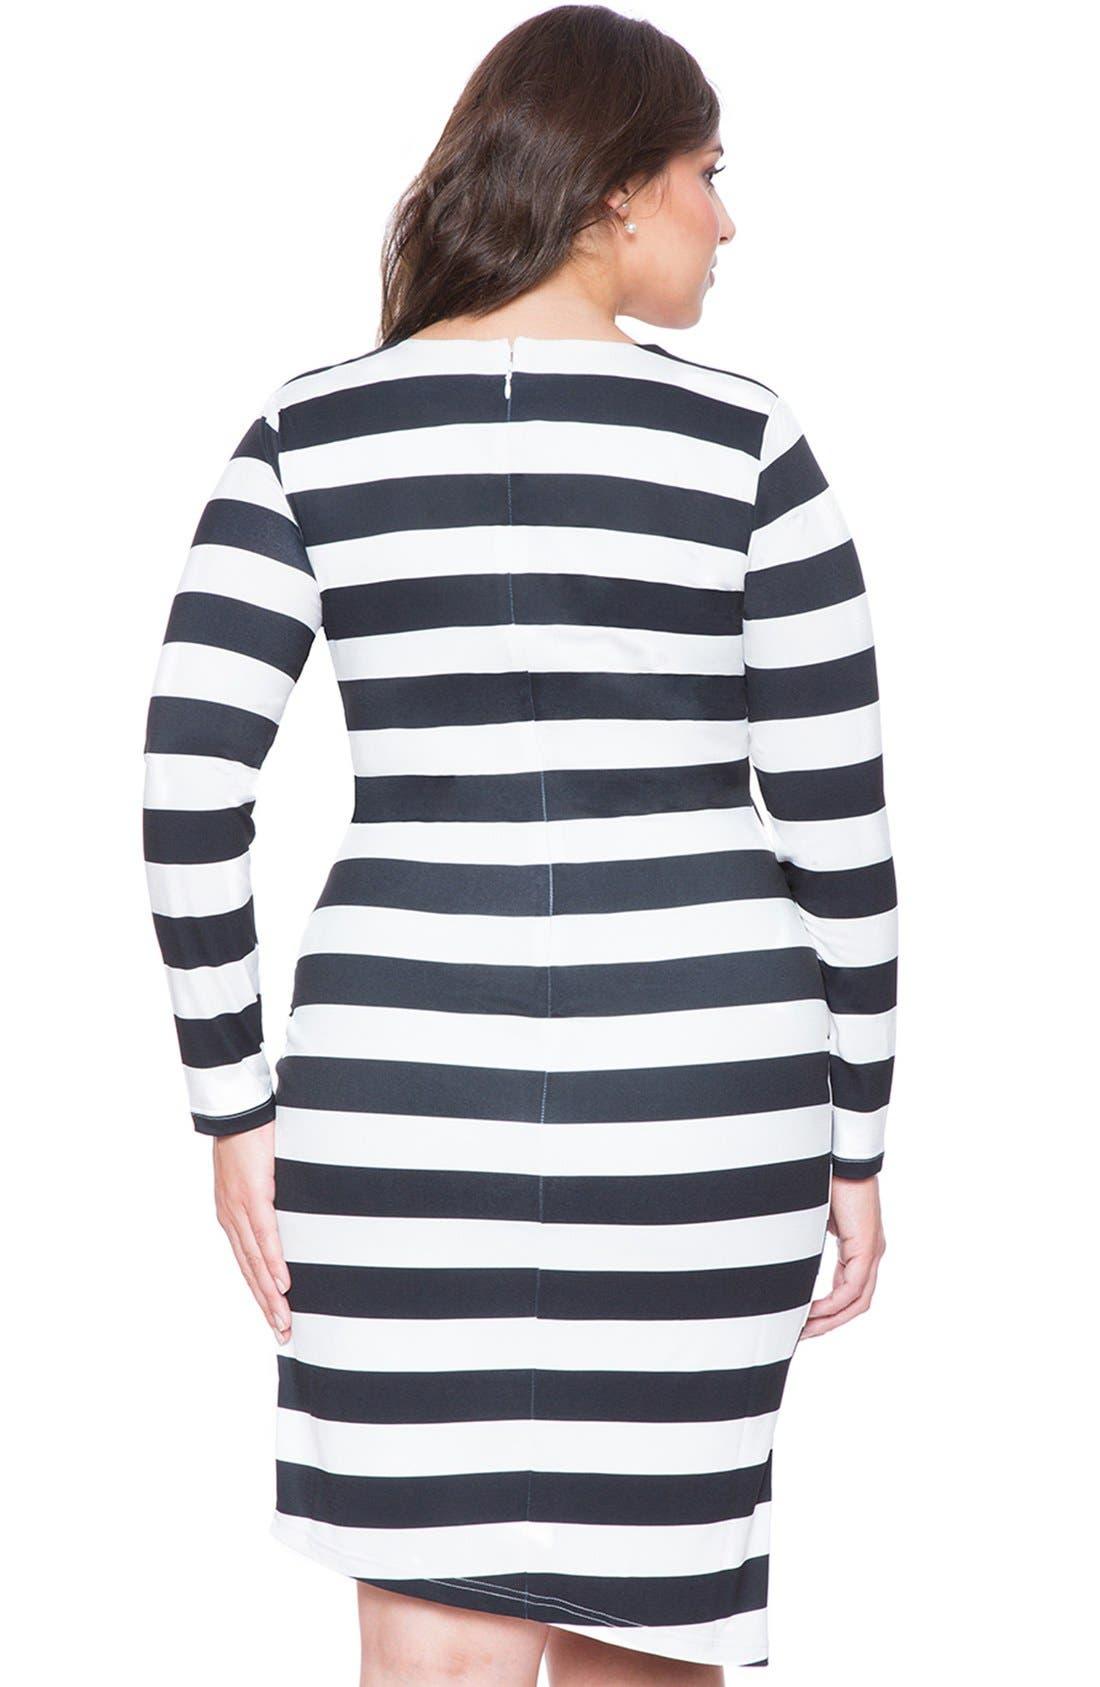 ELOQUII,                             Stripe Asymmetrical Wrap Dress,                             Alternate thumbnail 2, color,                             005